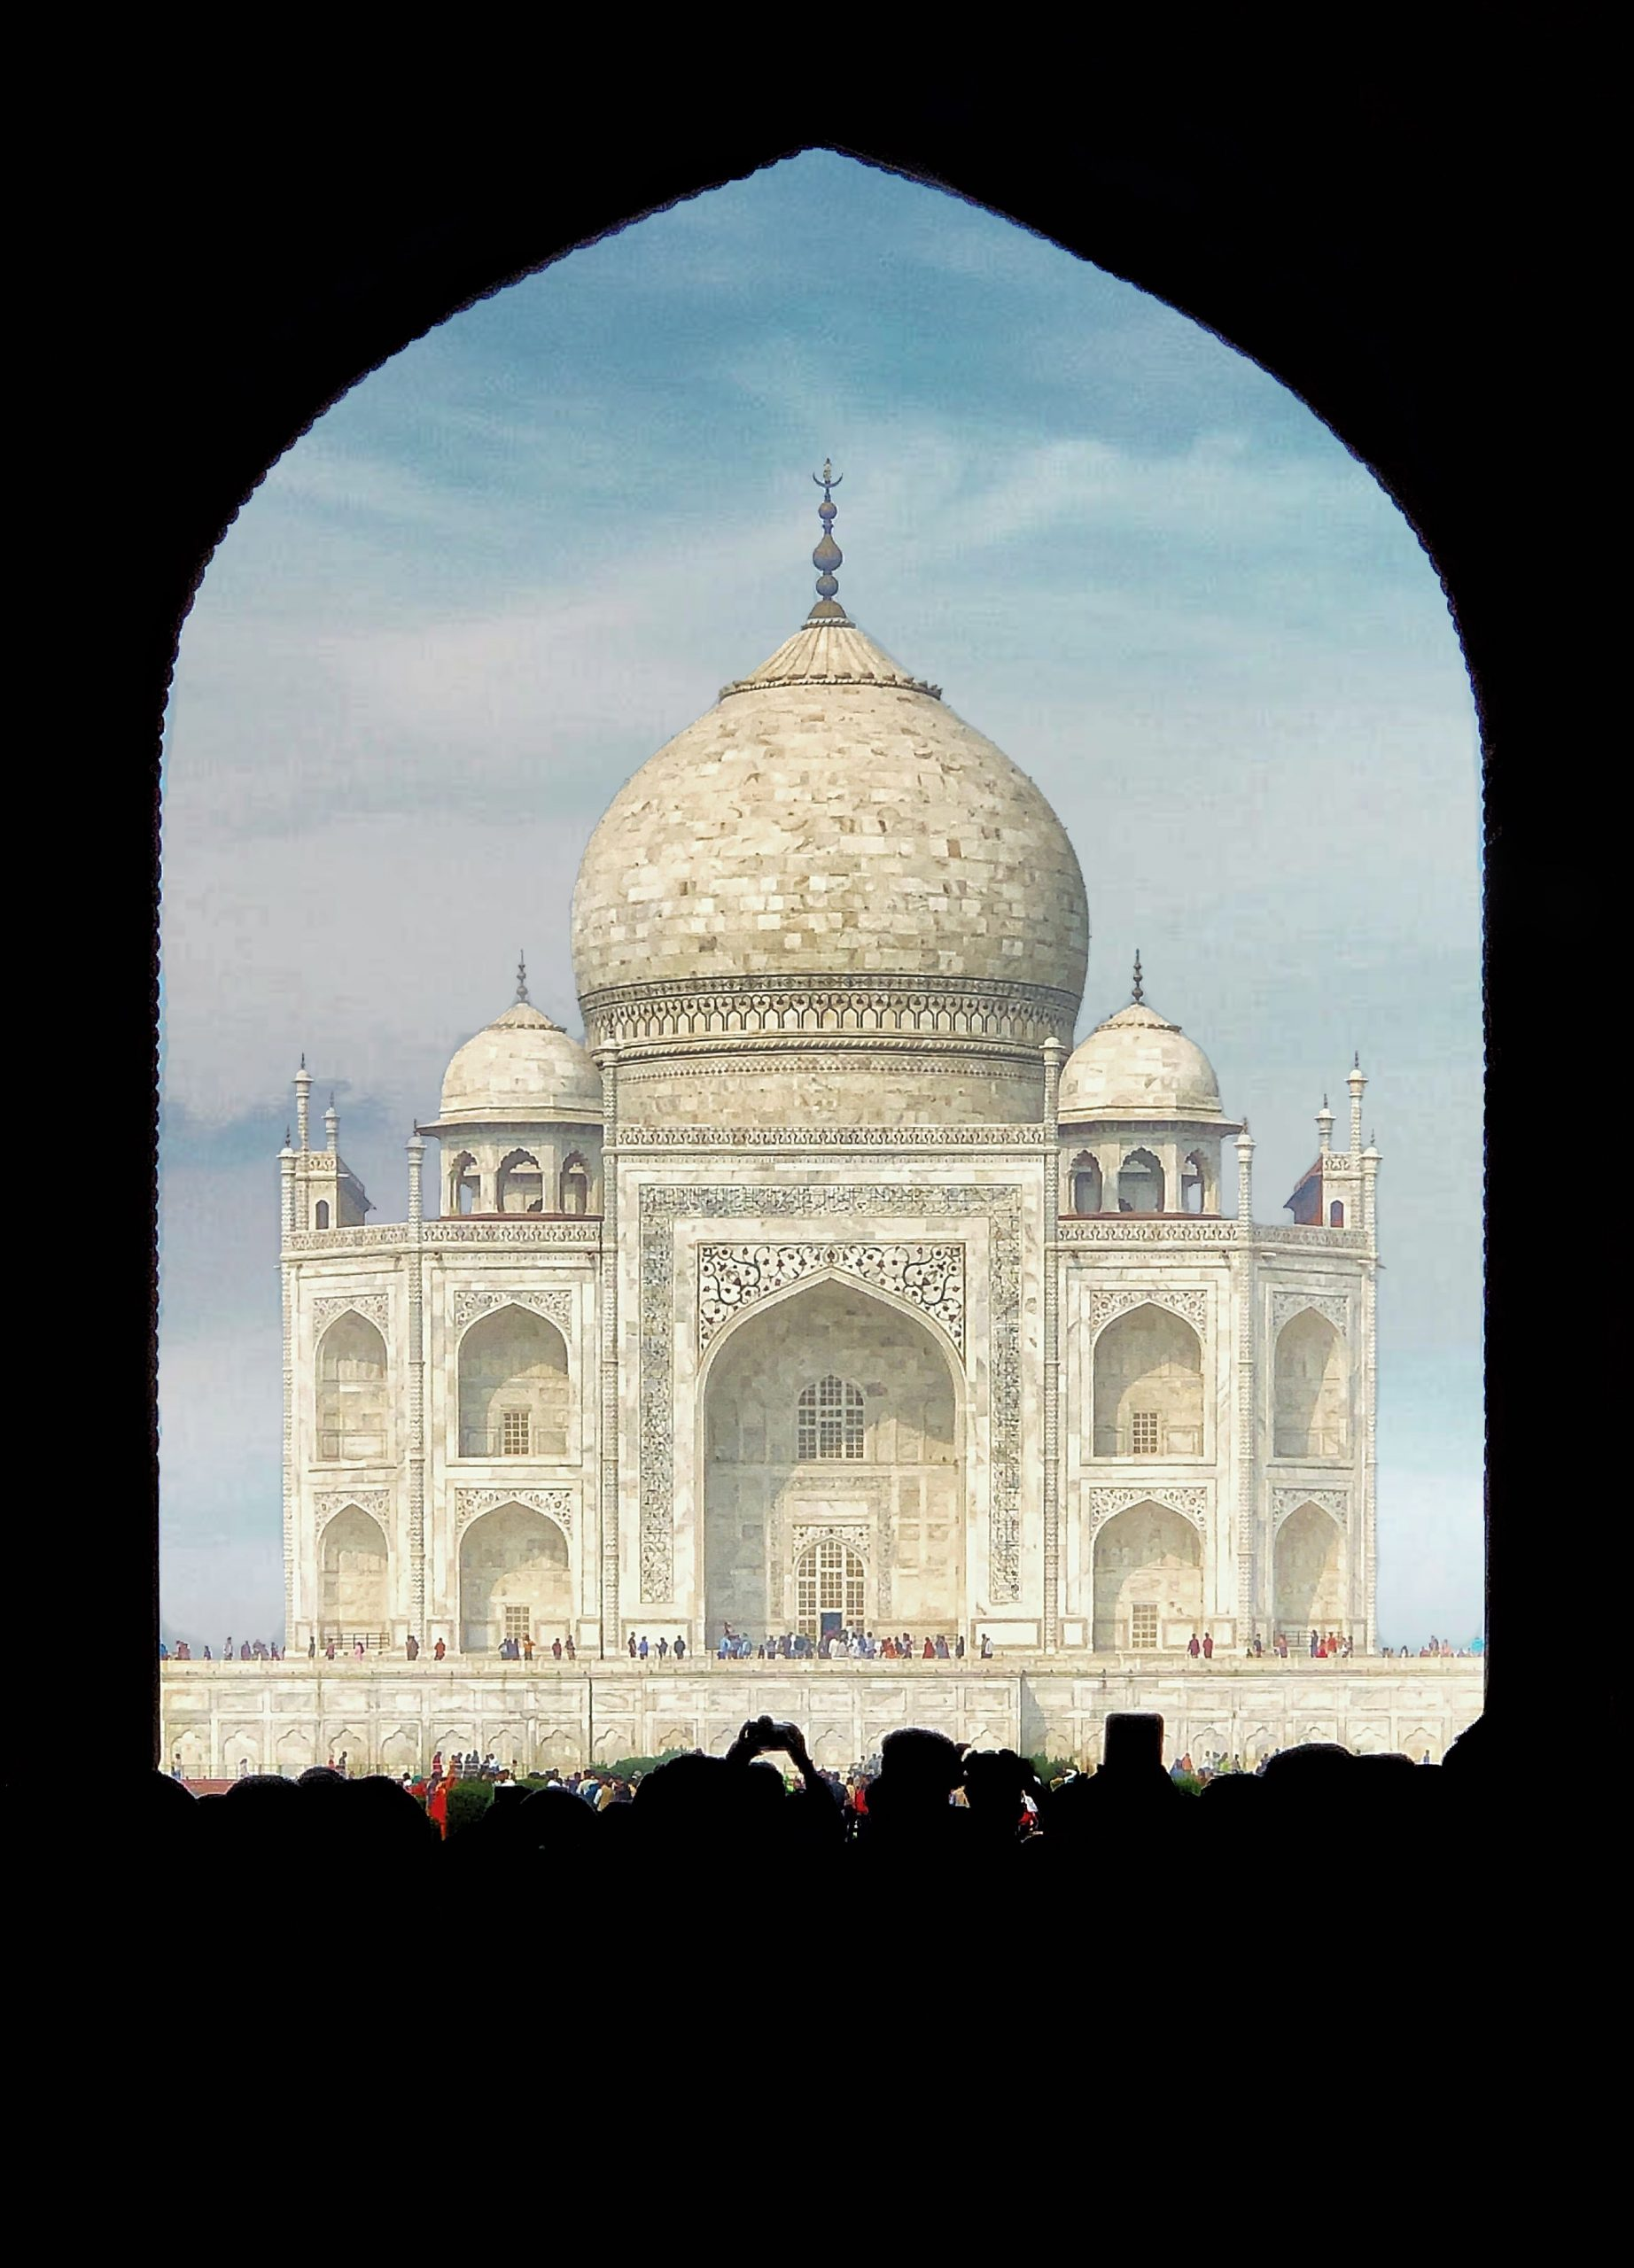 Taj Mahal through the door.